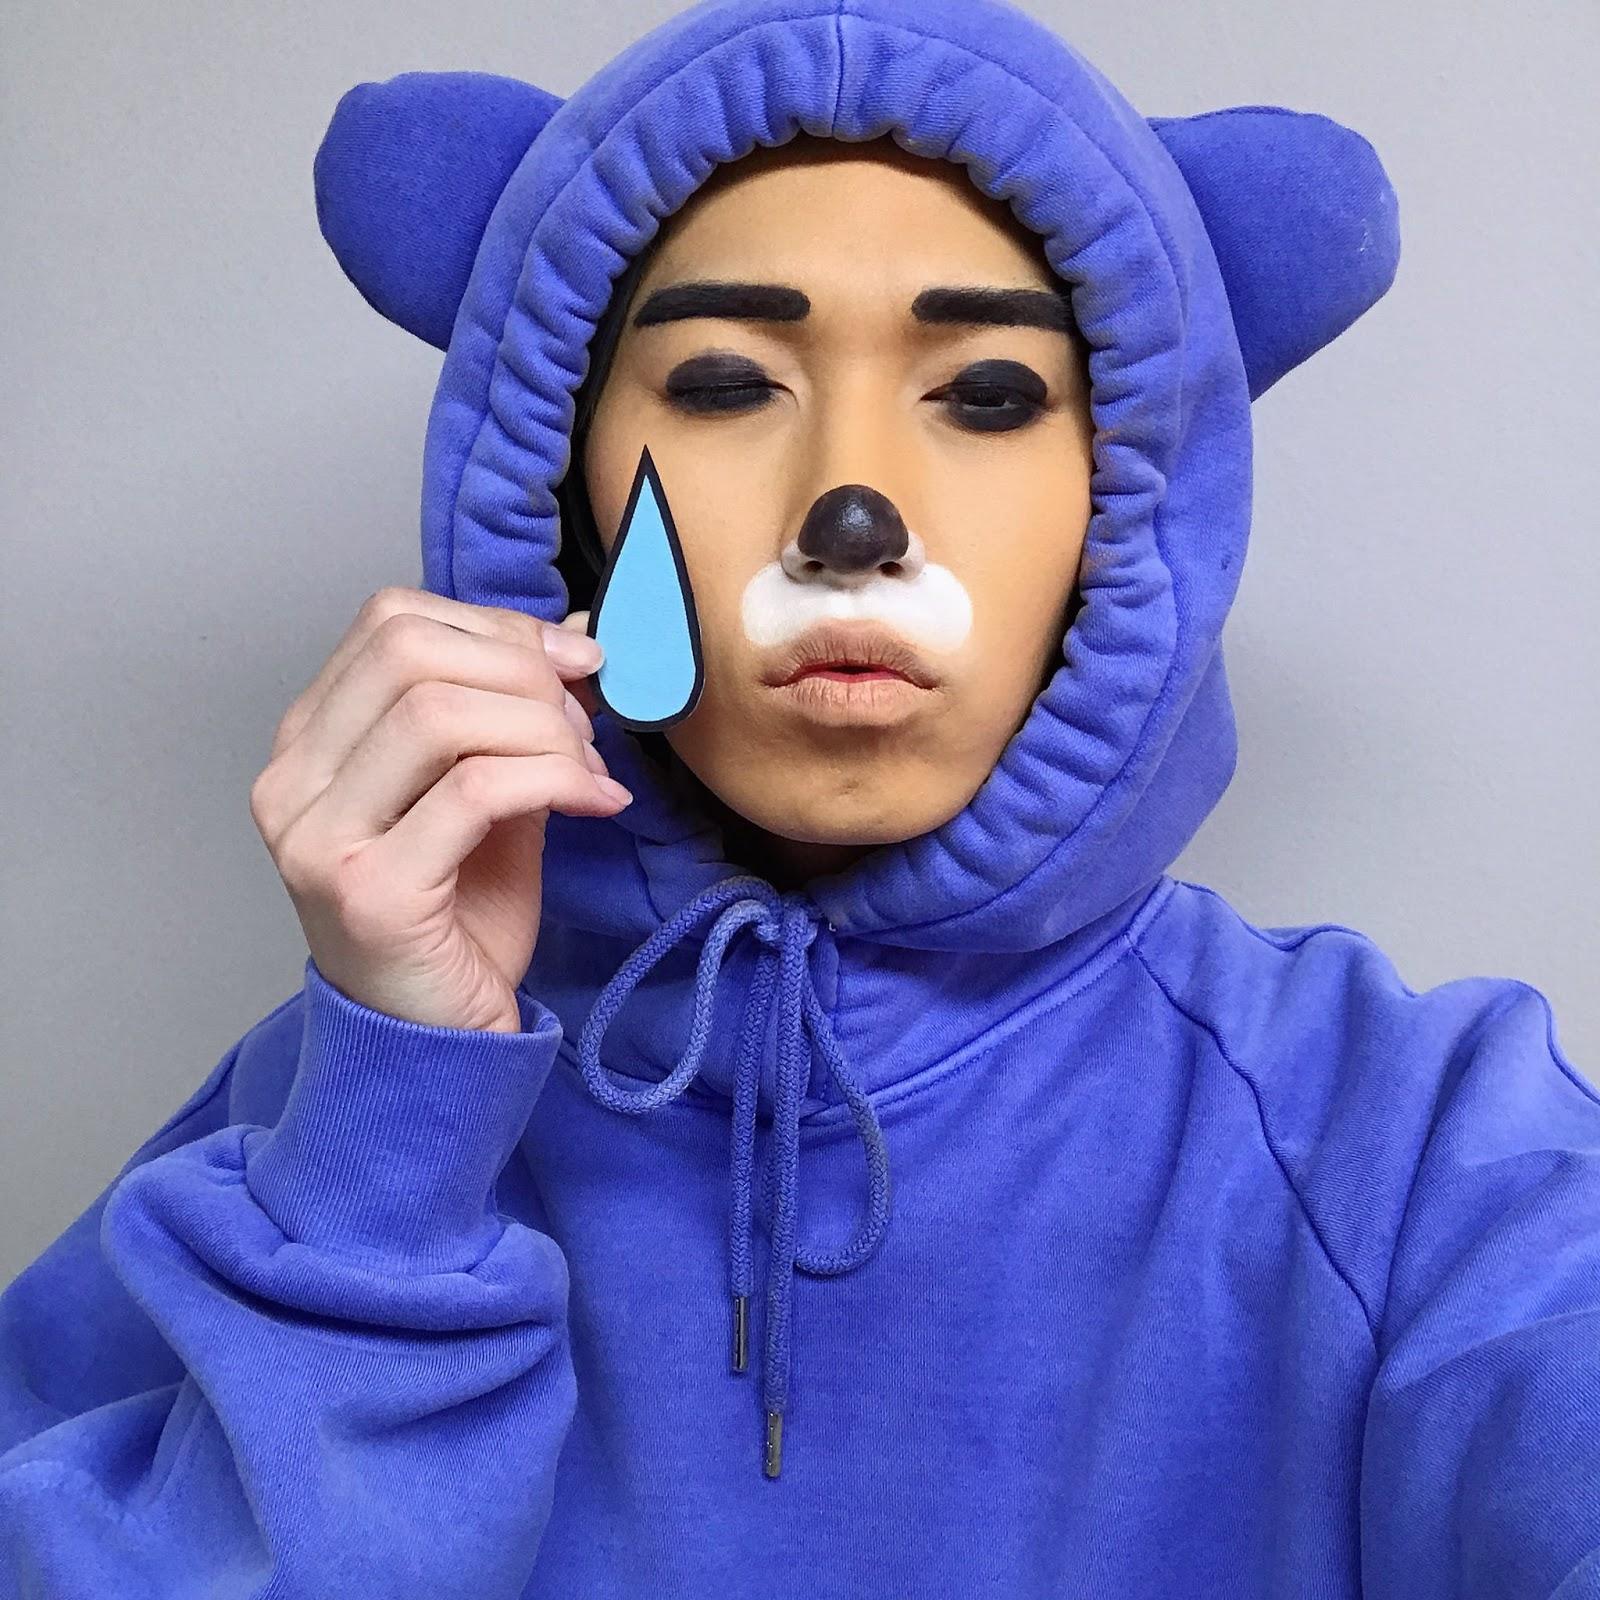 keonhee costume5